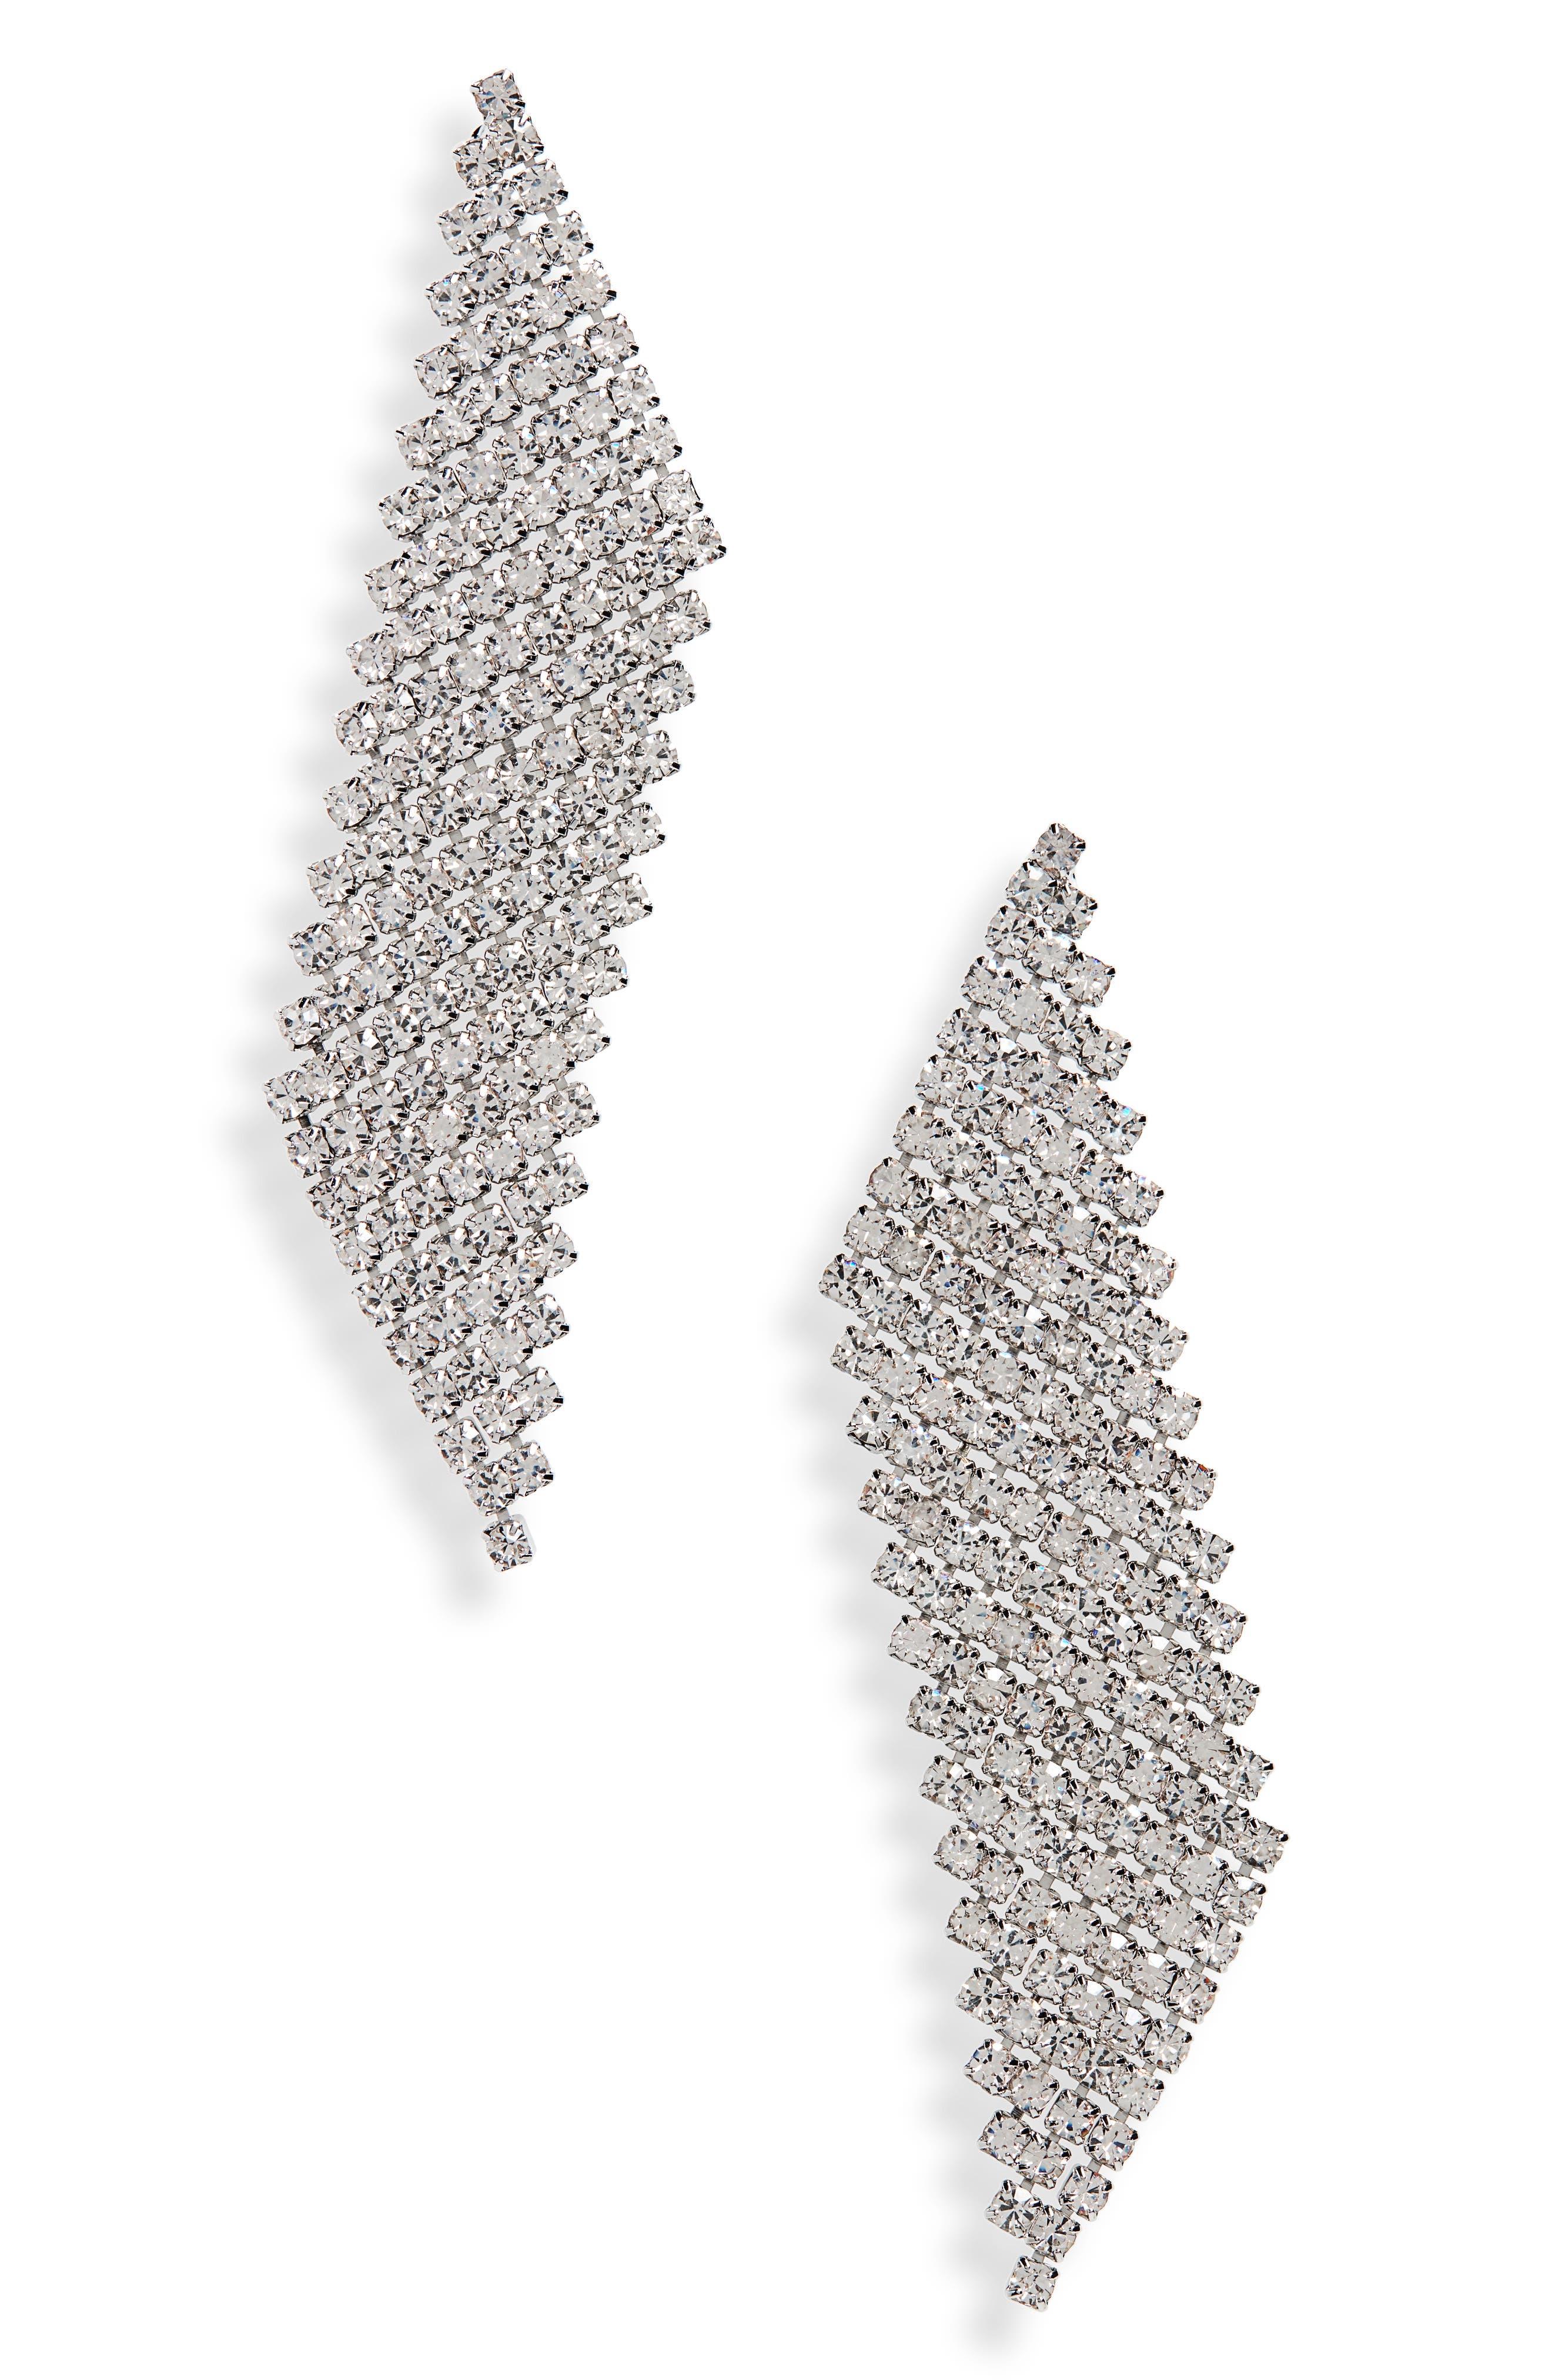 Crystal Slice Earrings,                         Main,                         color, SILVER/ CRYSTAL